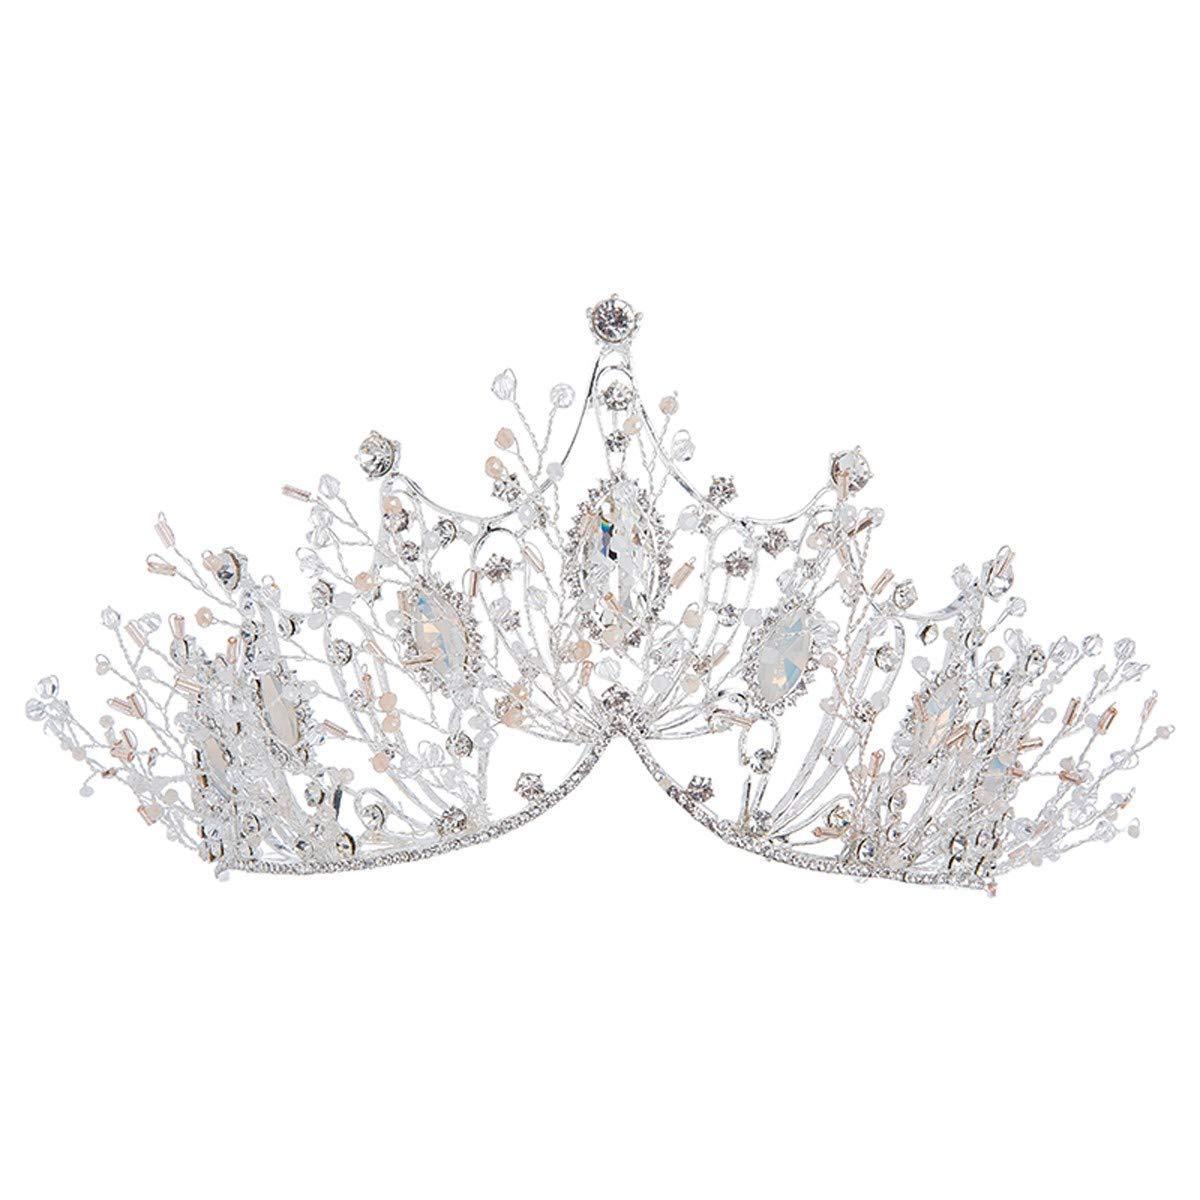 Girls Crown, Beautiful headdress/Bridal Crown Accessories Crown 2 Wedding Accessories by Zehaer (Image #1)